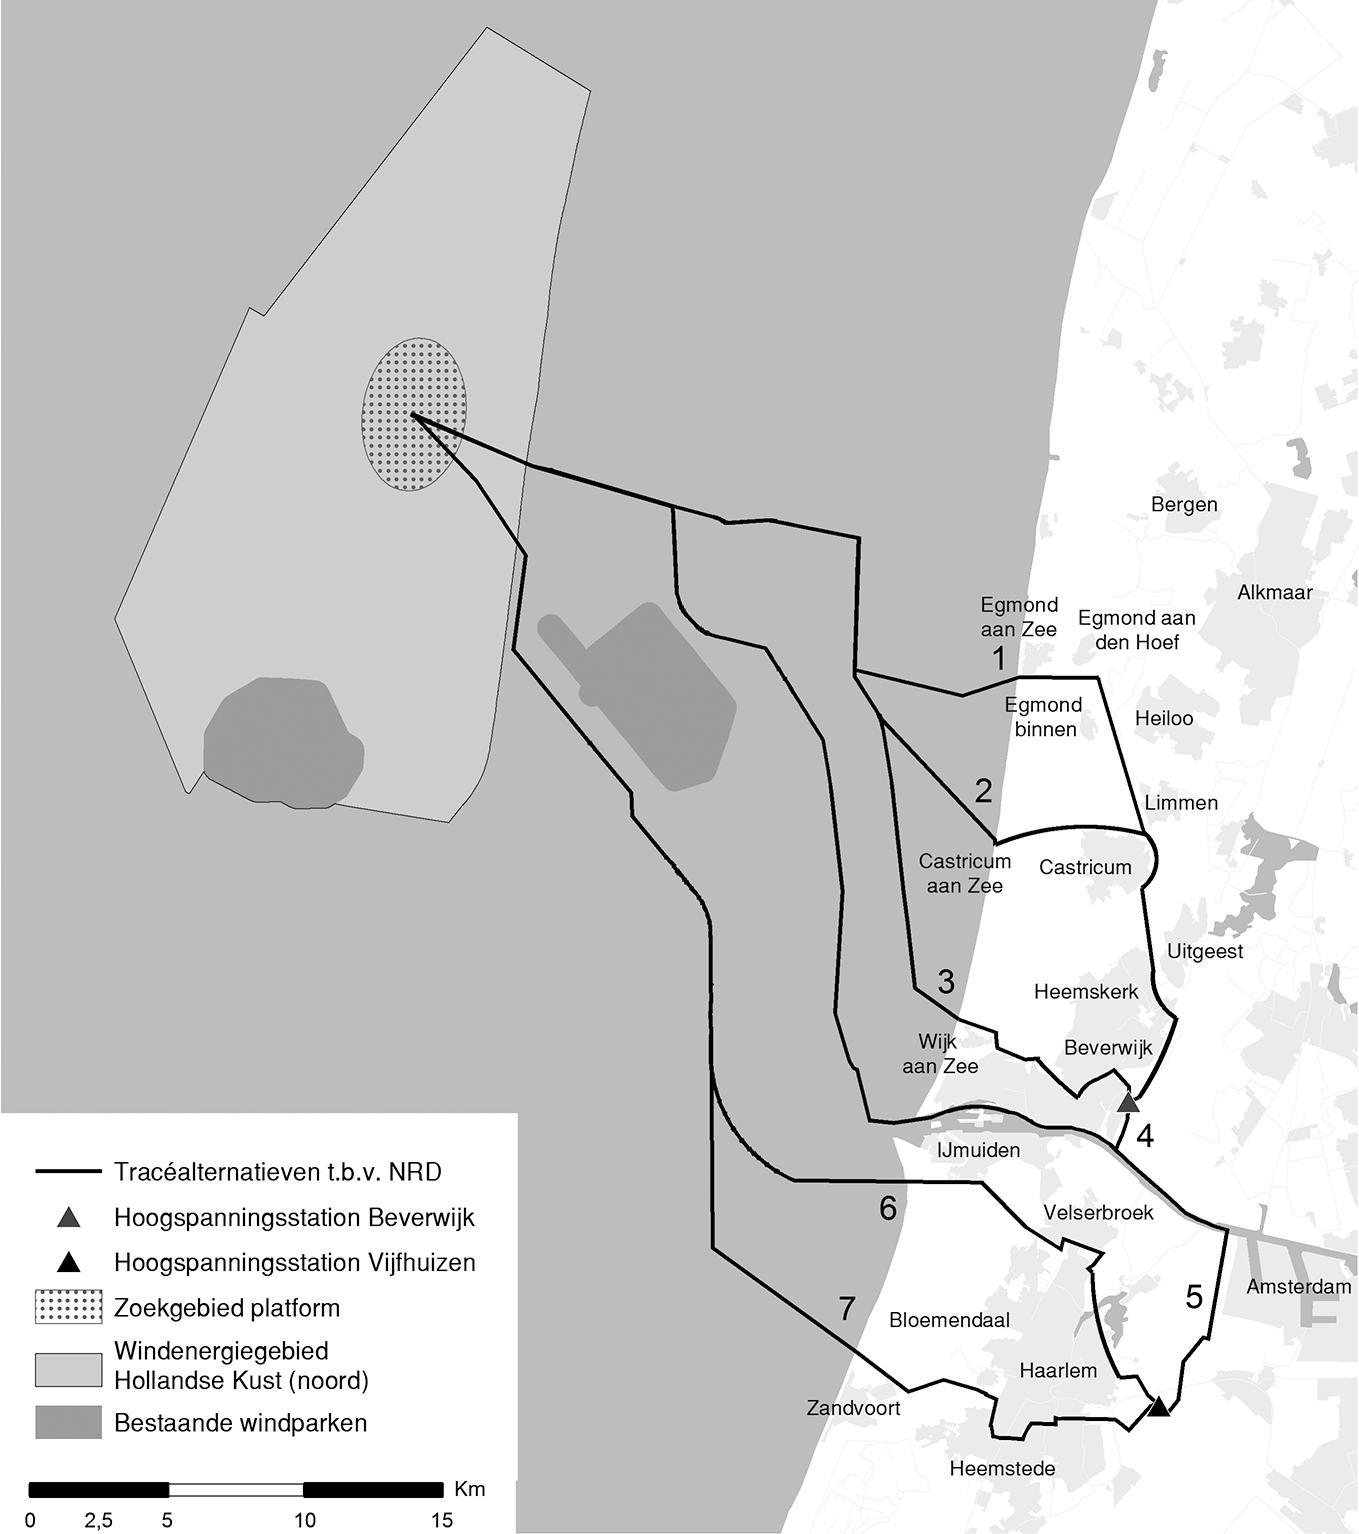 Conceptnotities reikwijdte en detailniveau kavel V Hollandse Kust (noord) en net op zee ter inzage